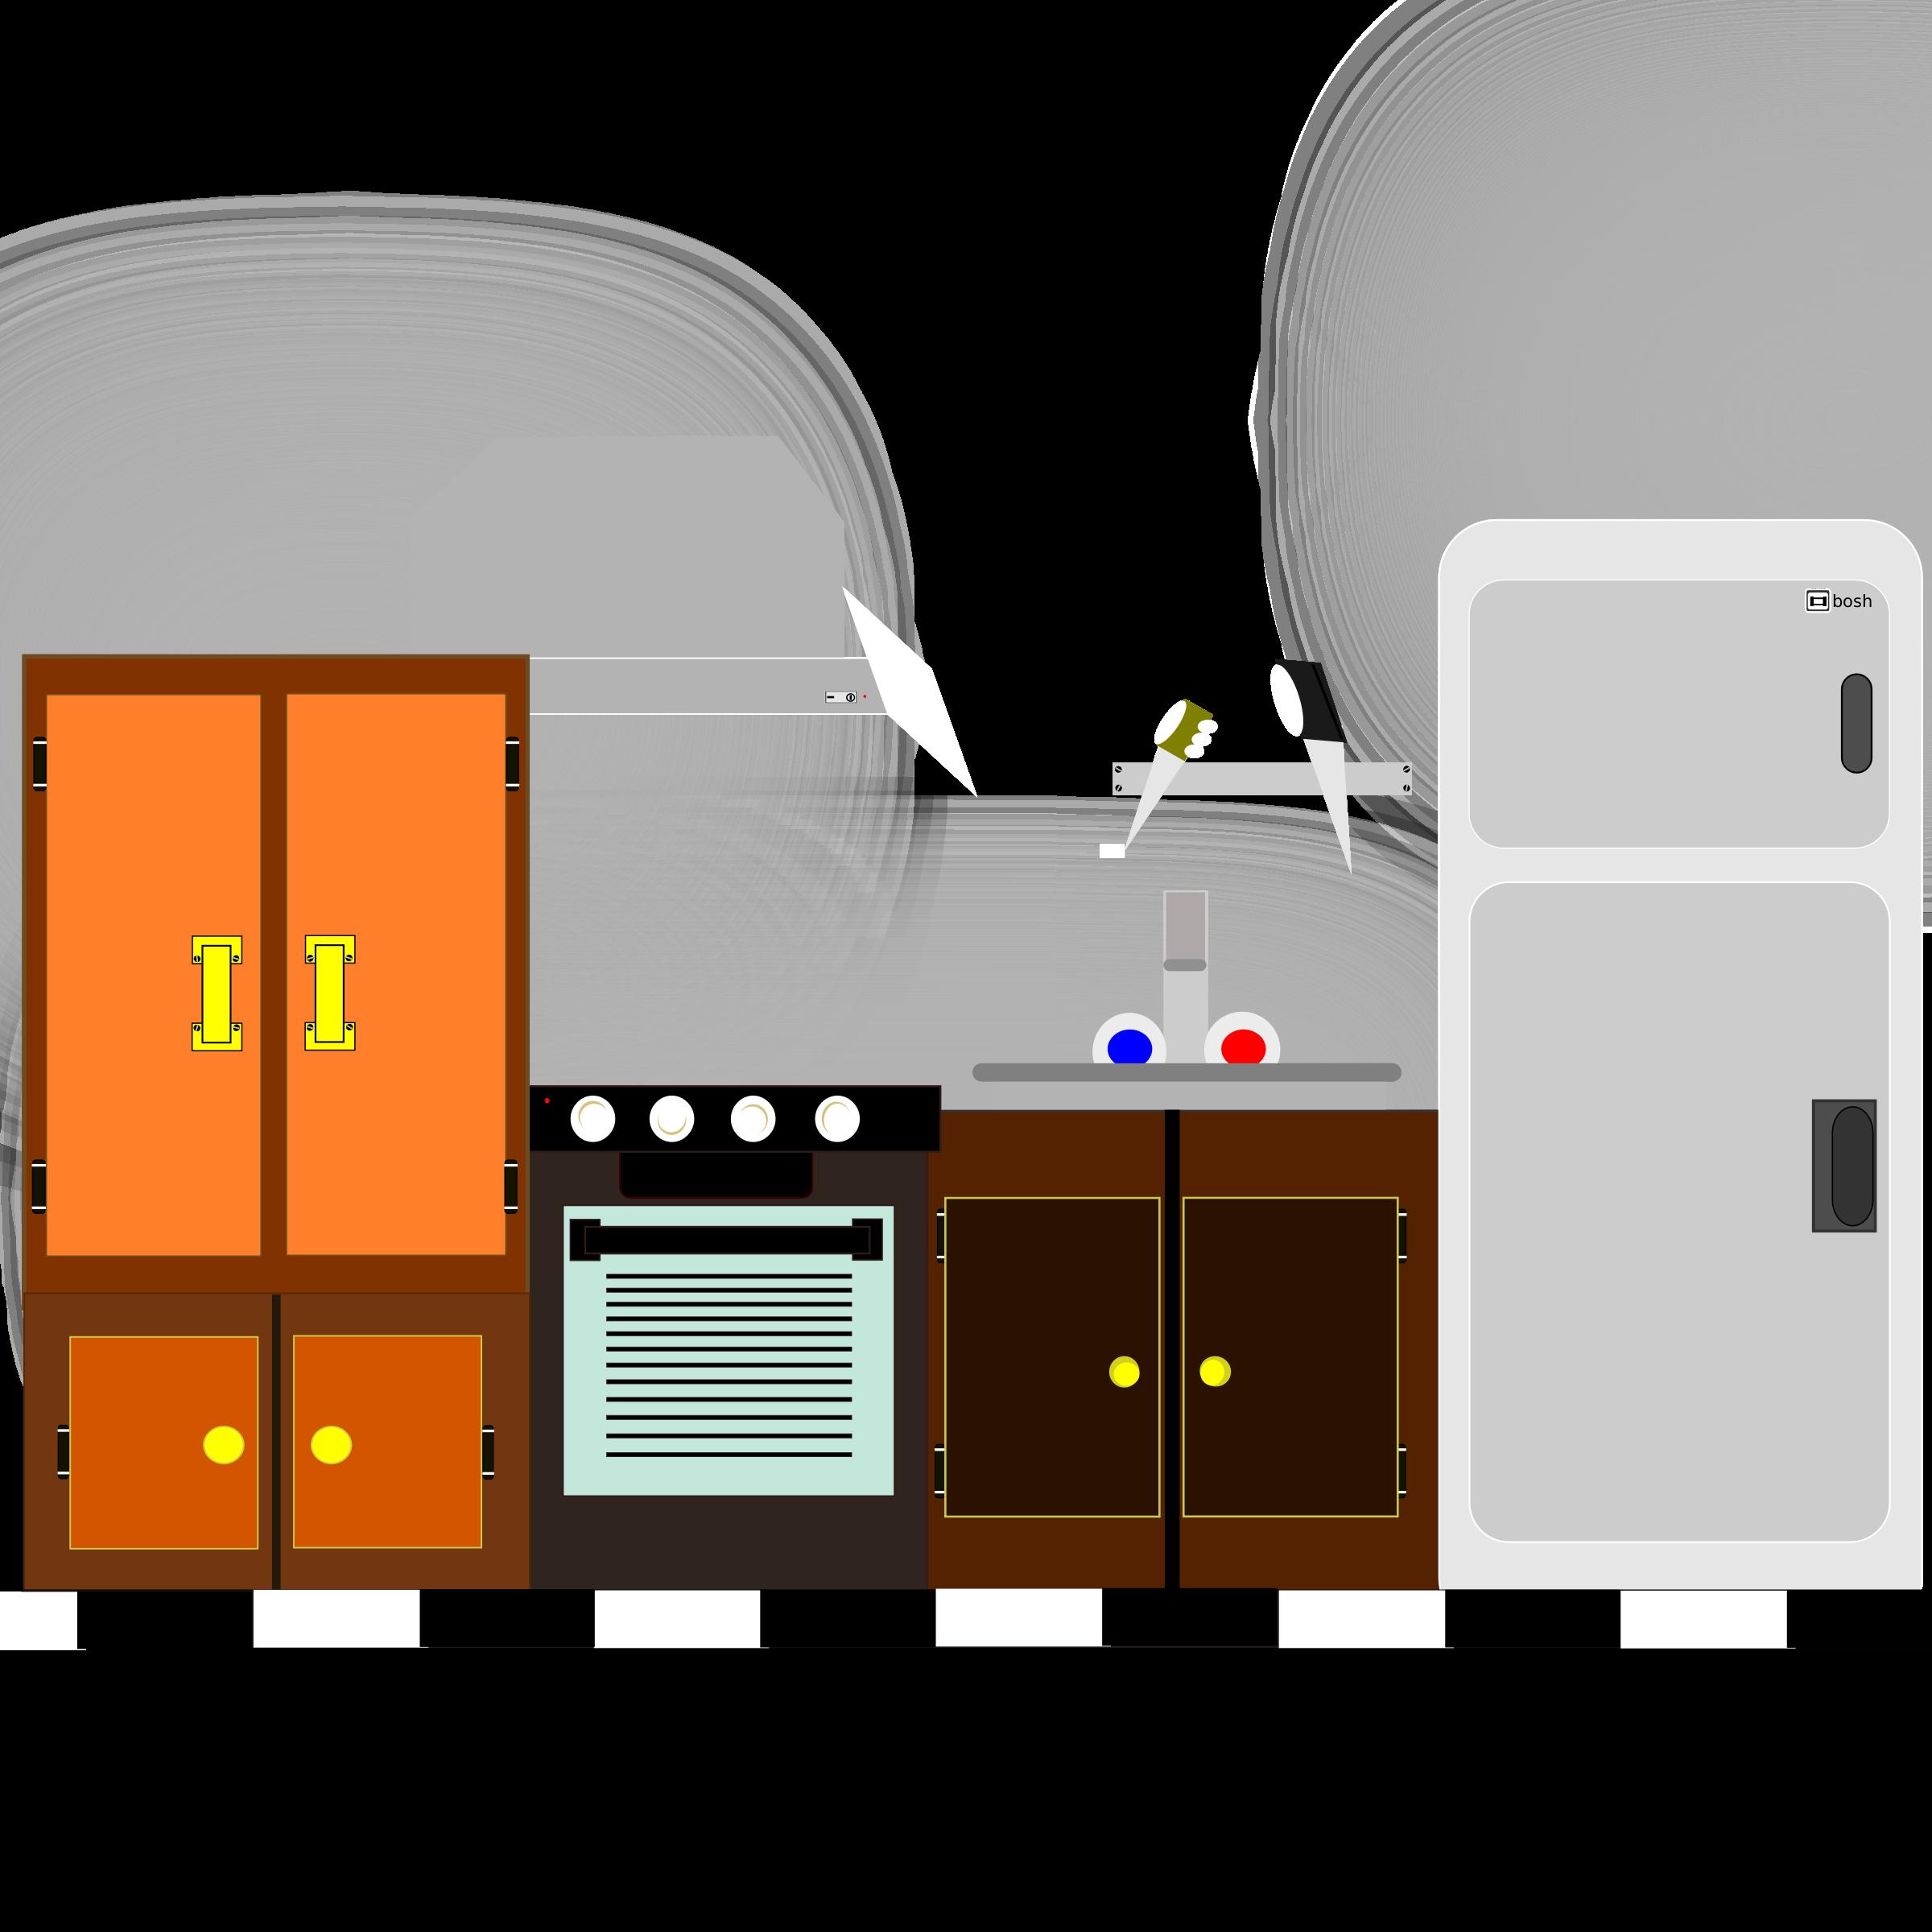 Kitchen clipart kitchen furniture Art Kitchen Images kitchen%20clipart Clip